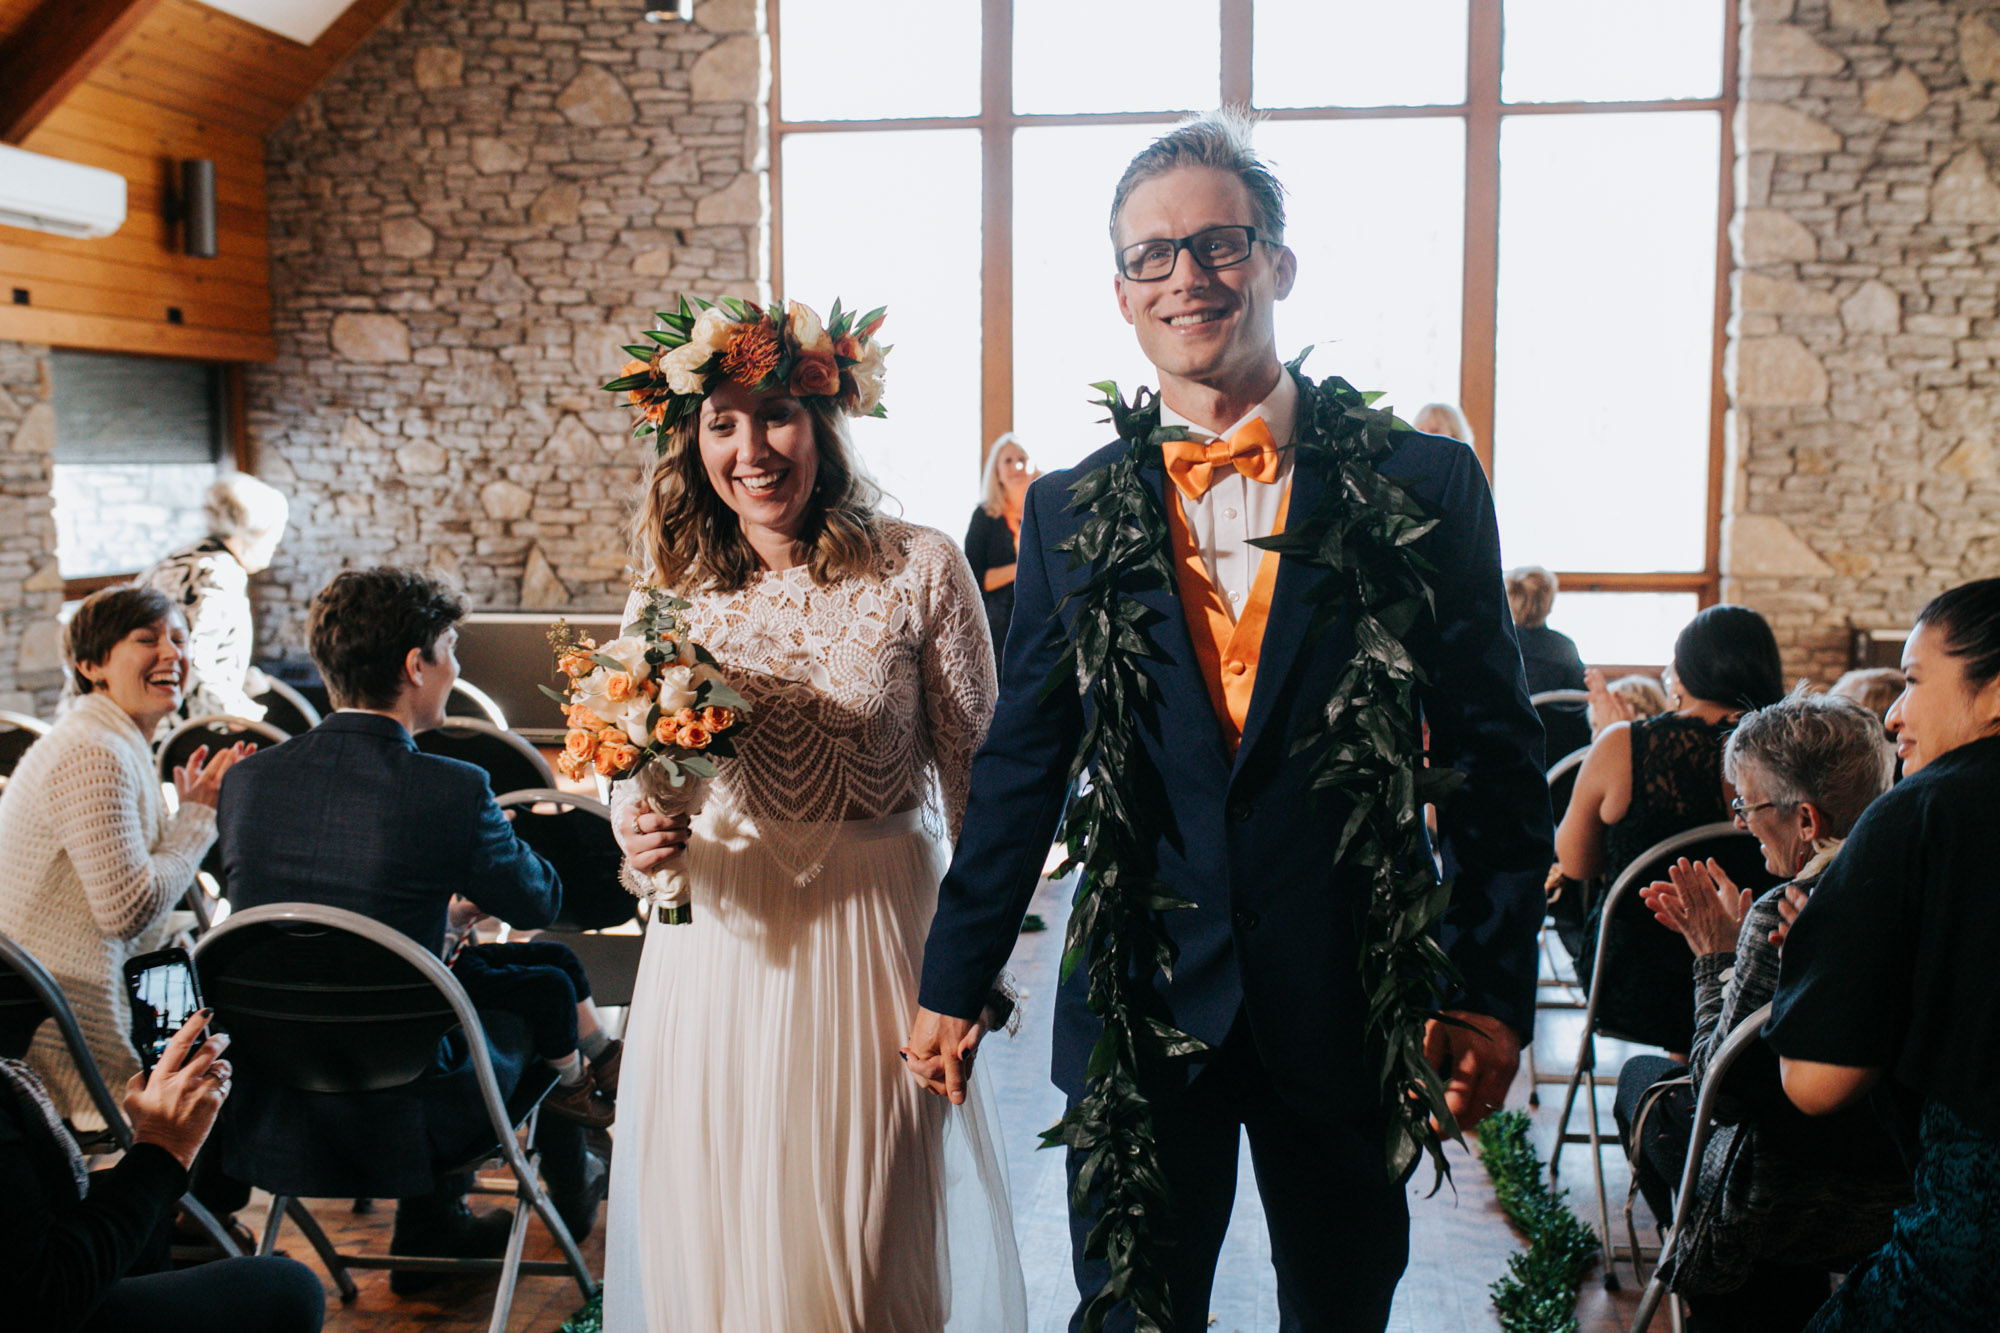 oak-openings-lodge-wedding-6812.jpg